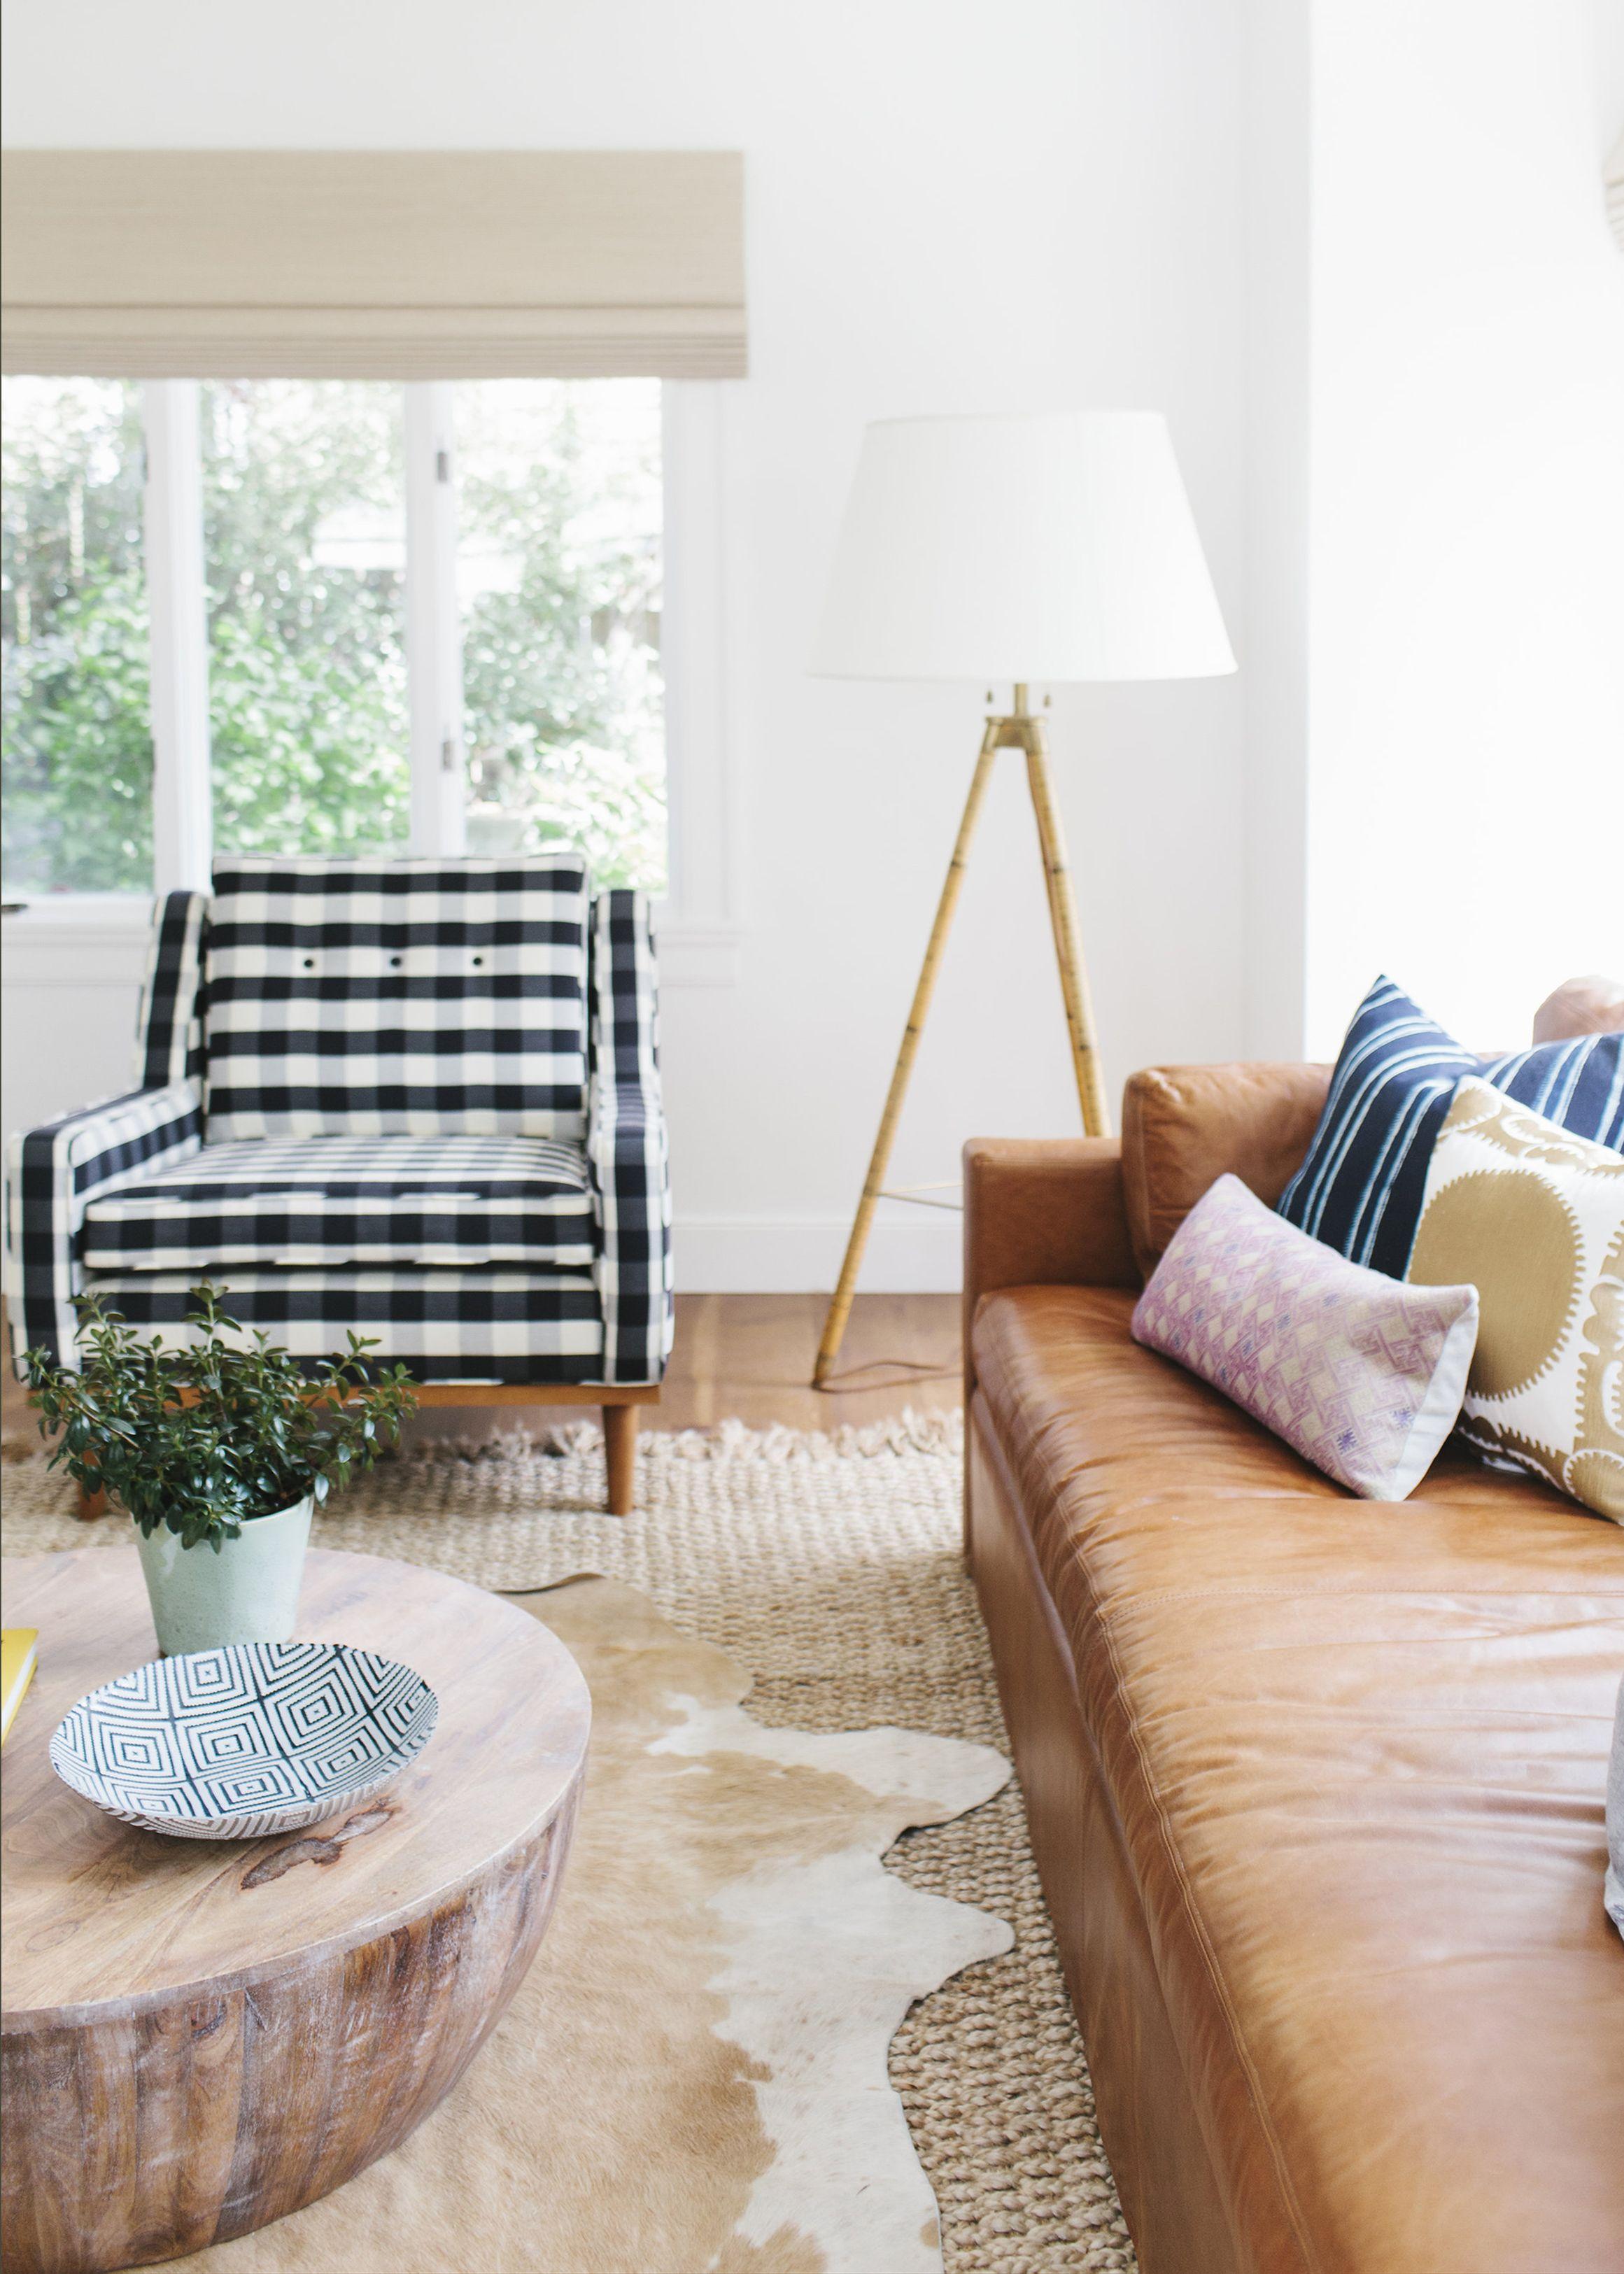 Amazing Interiors with Beautiful Natural Light   Dizajn